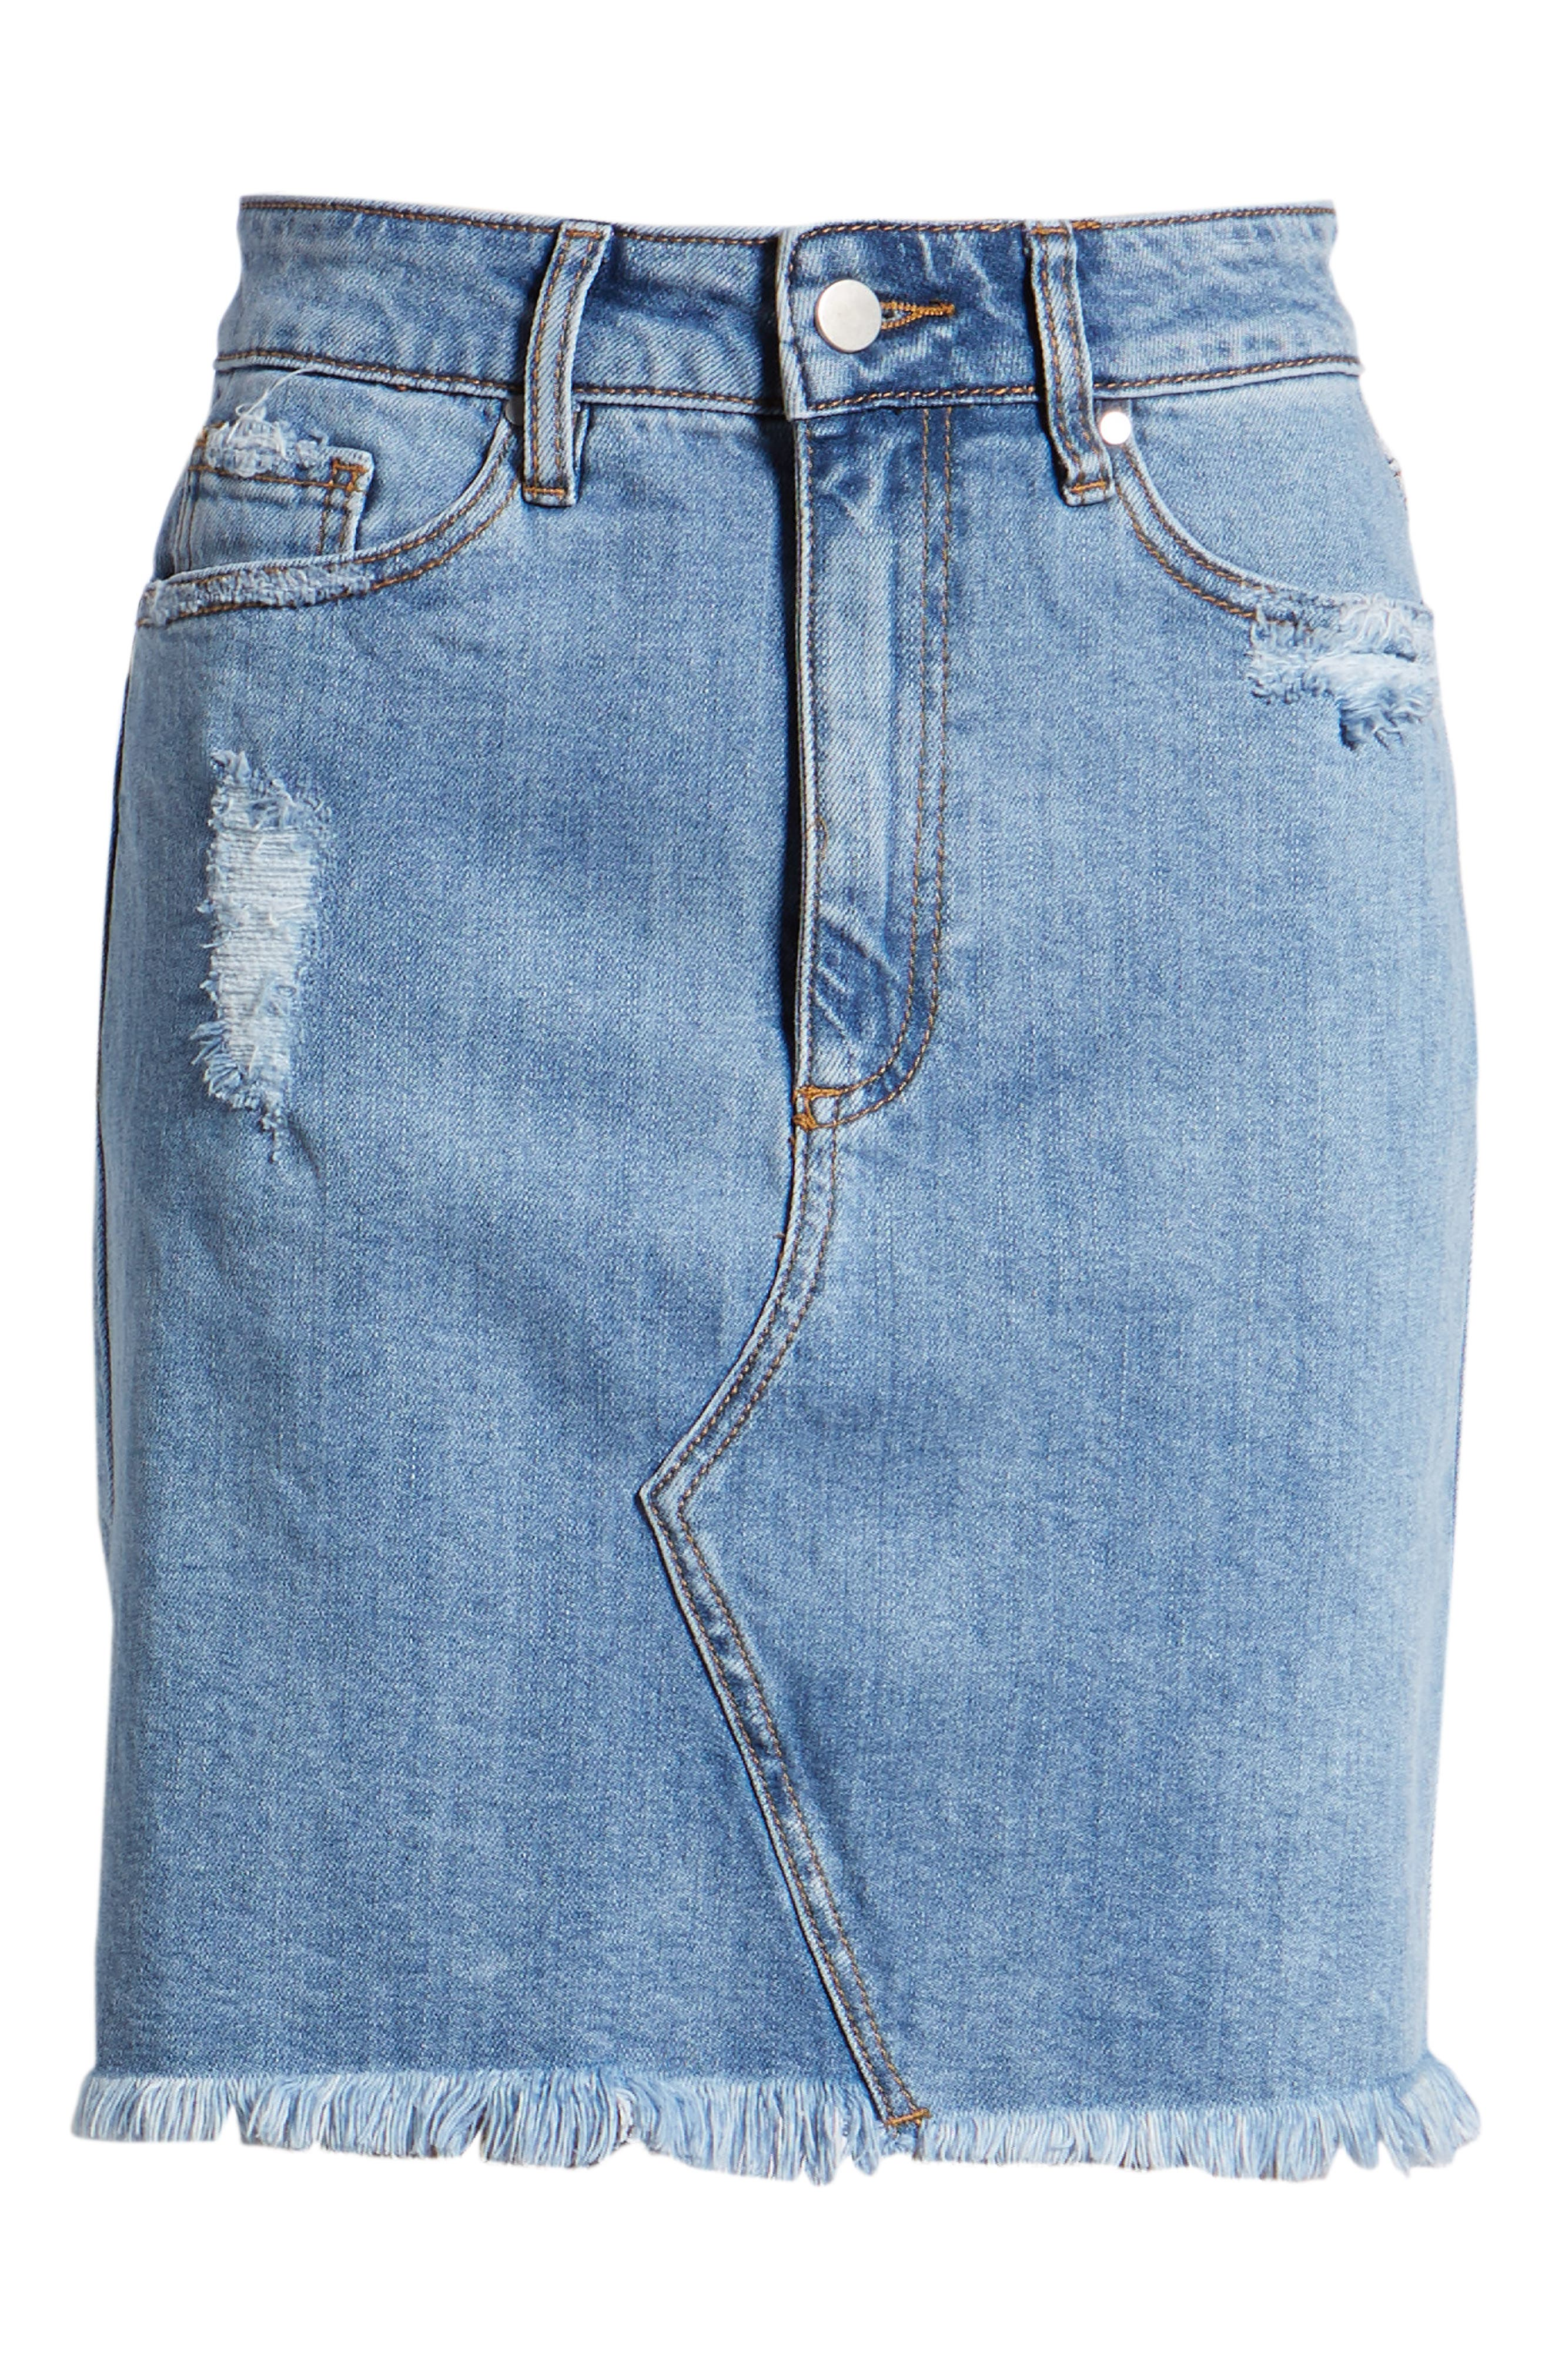 AFRM,                             Distressed Denim Skirt,                             Alternate thumbnail 7, color,                             400